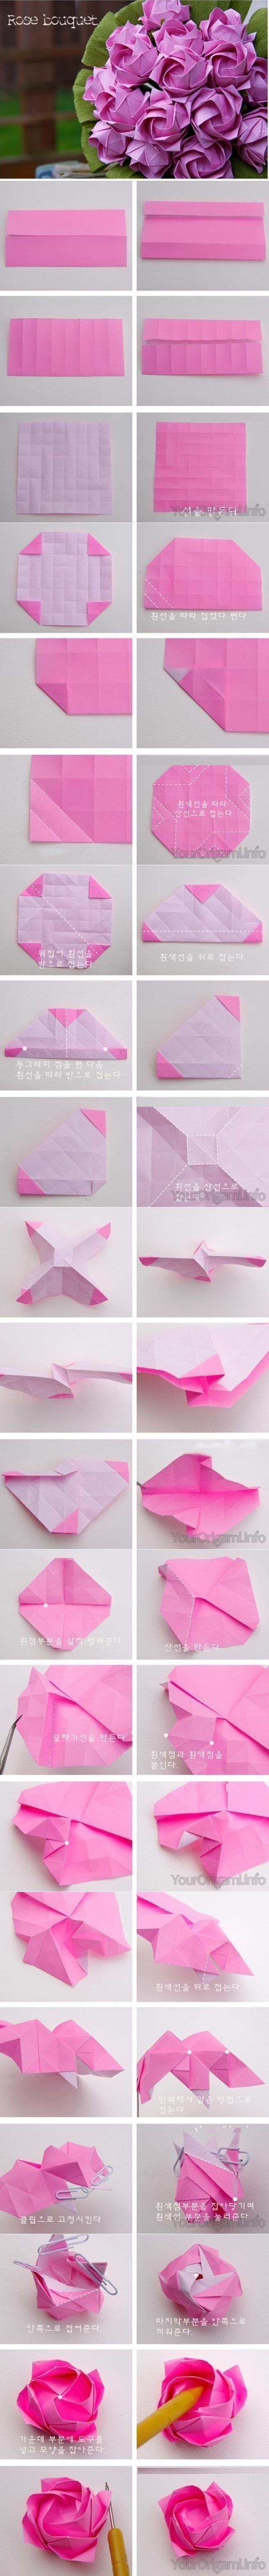 Diy Beautiful Origami Paper Rose Bouquet Fab Art Diy